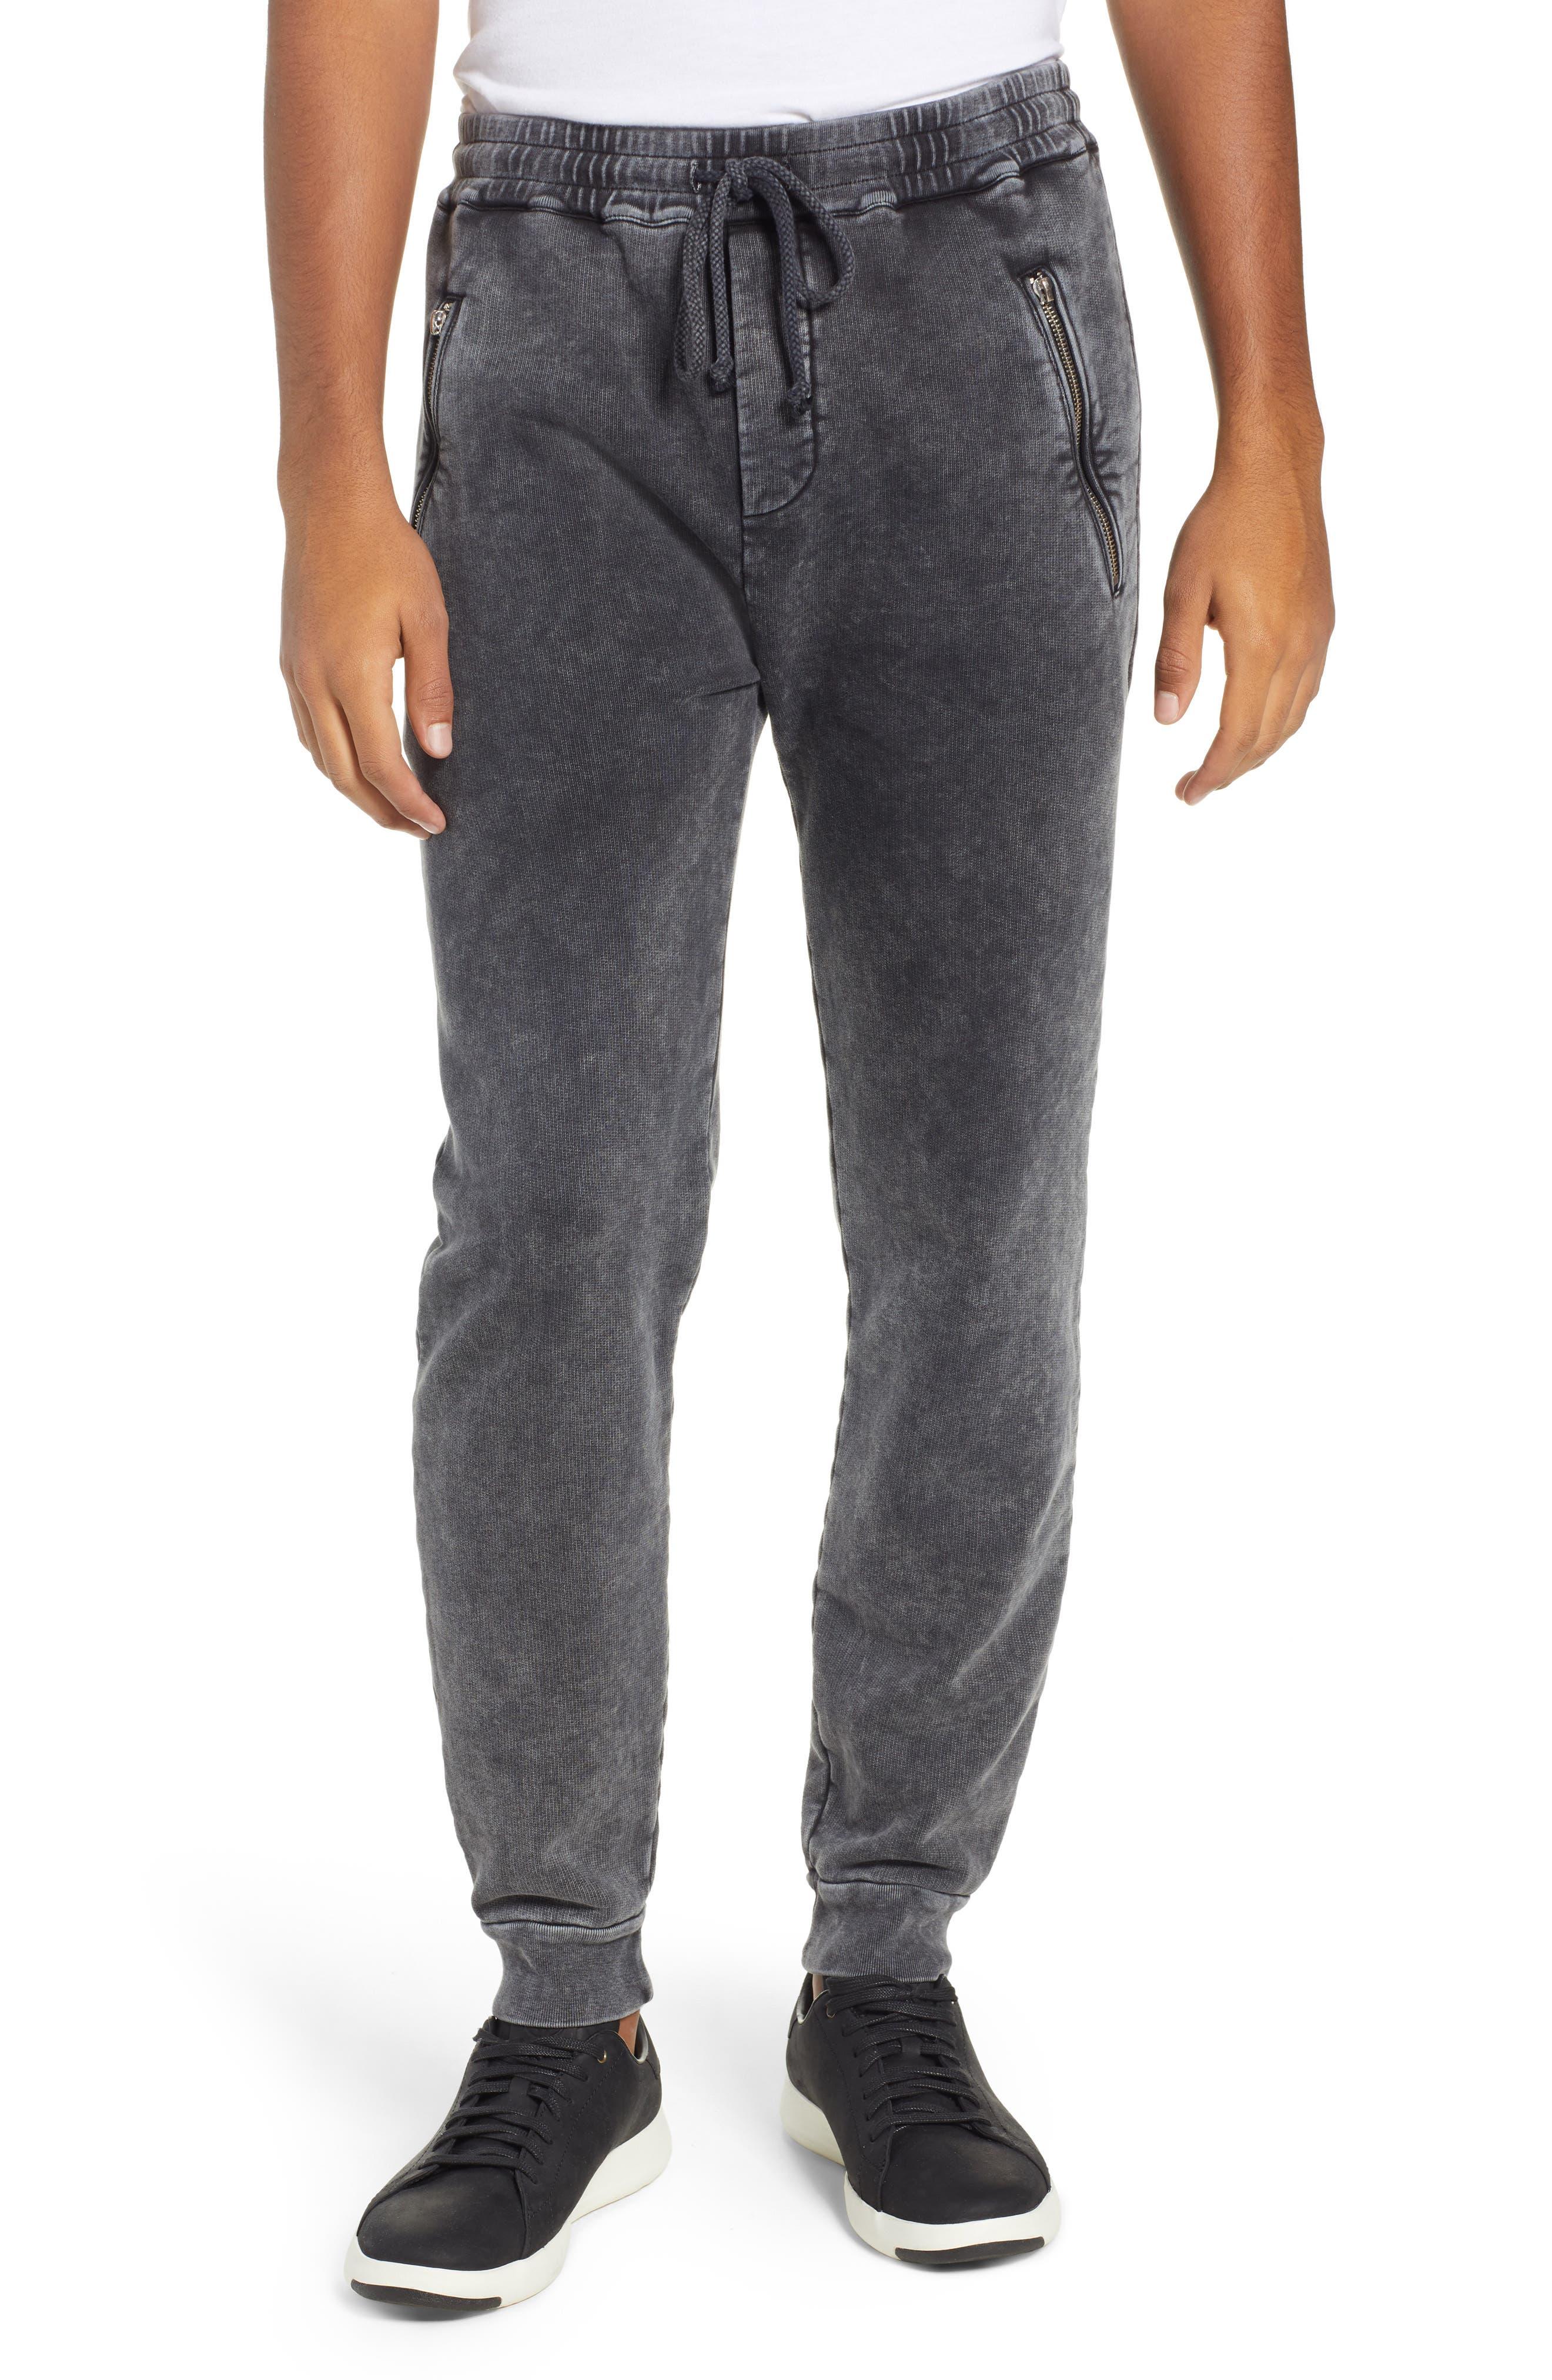 THE KOOPLES Slim Fit Track Pants, Main, color, BLACK WASHED